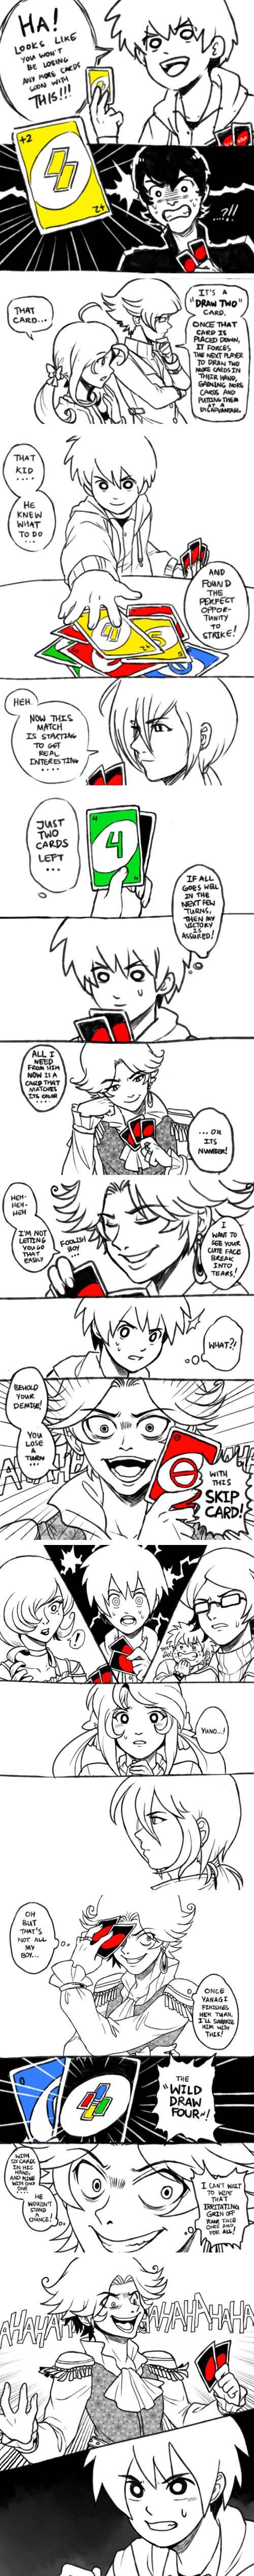 If uno were an anime  it's a lot like yu-gi-oh!